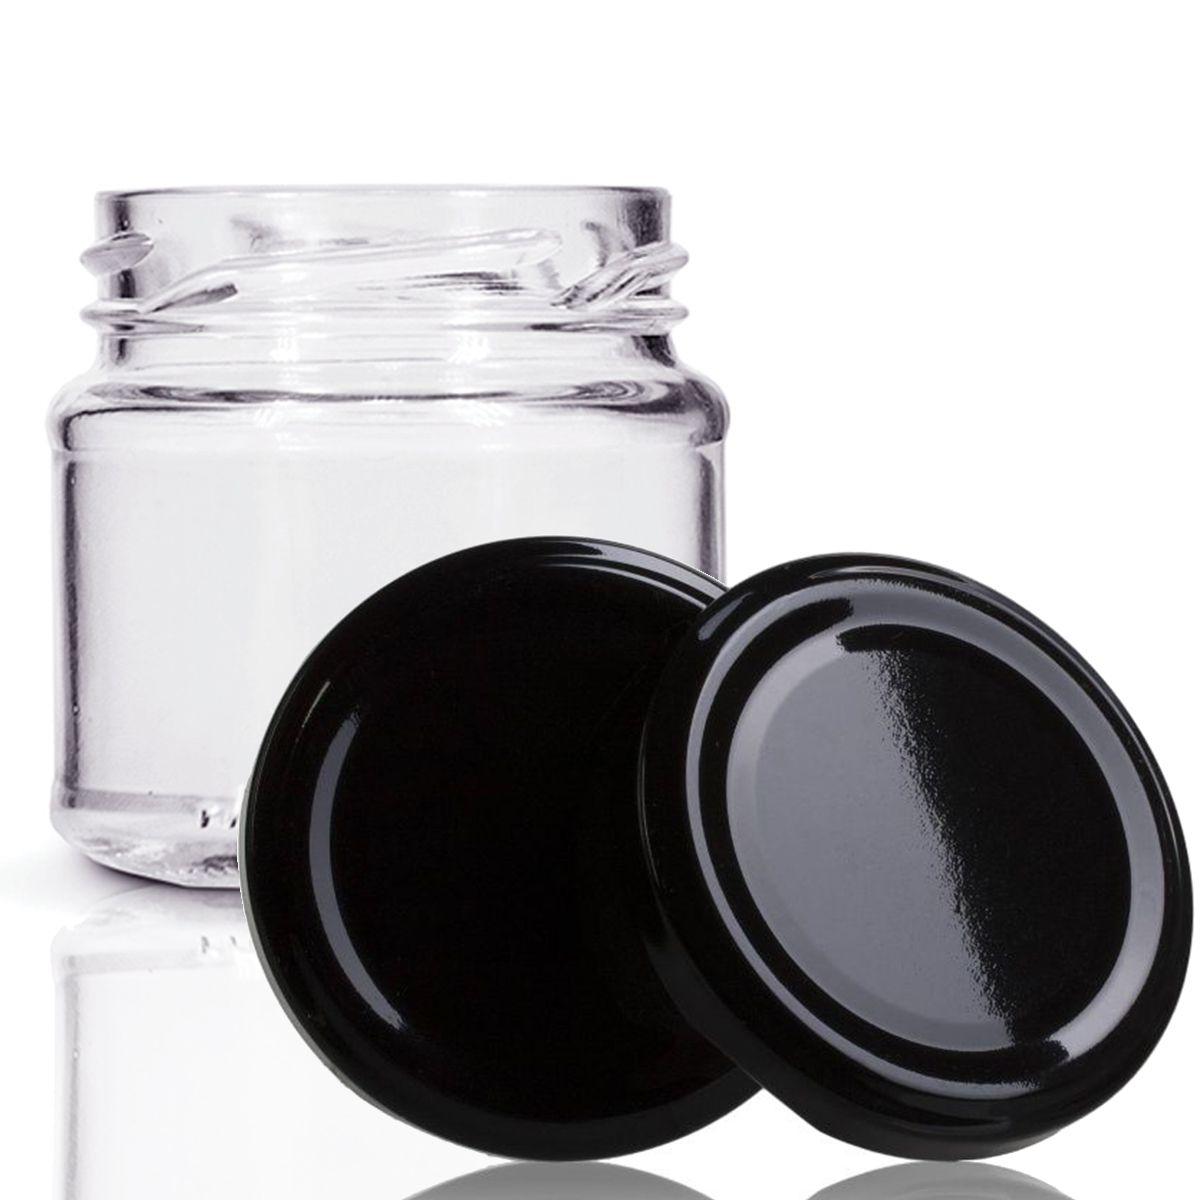 12 Potes De Vidro Mini Belém 150 Ml Tampa Preta + Lacre  - EMPÓRIO PACK